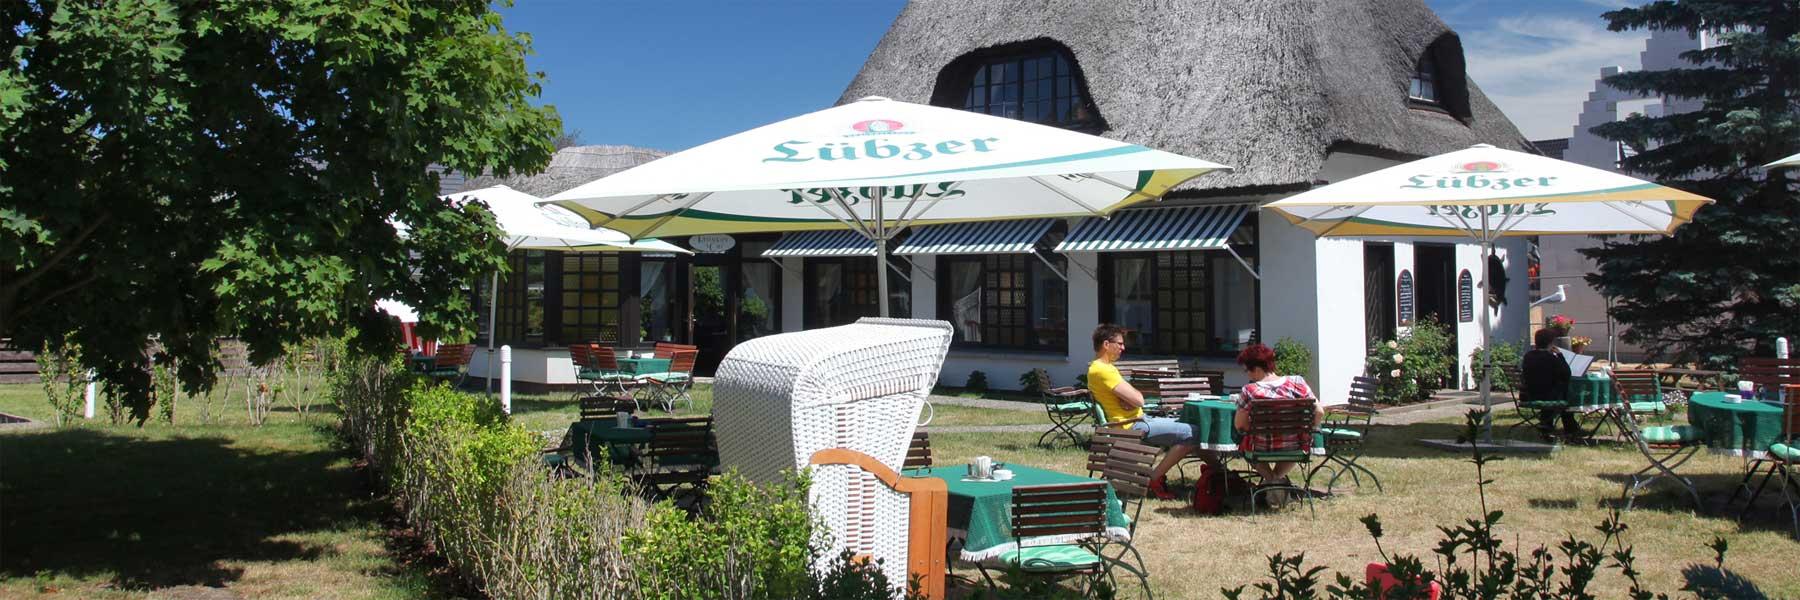 Garten - Caféstübchen und Pension Witt